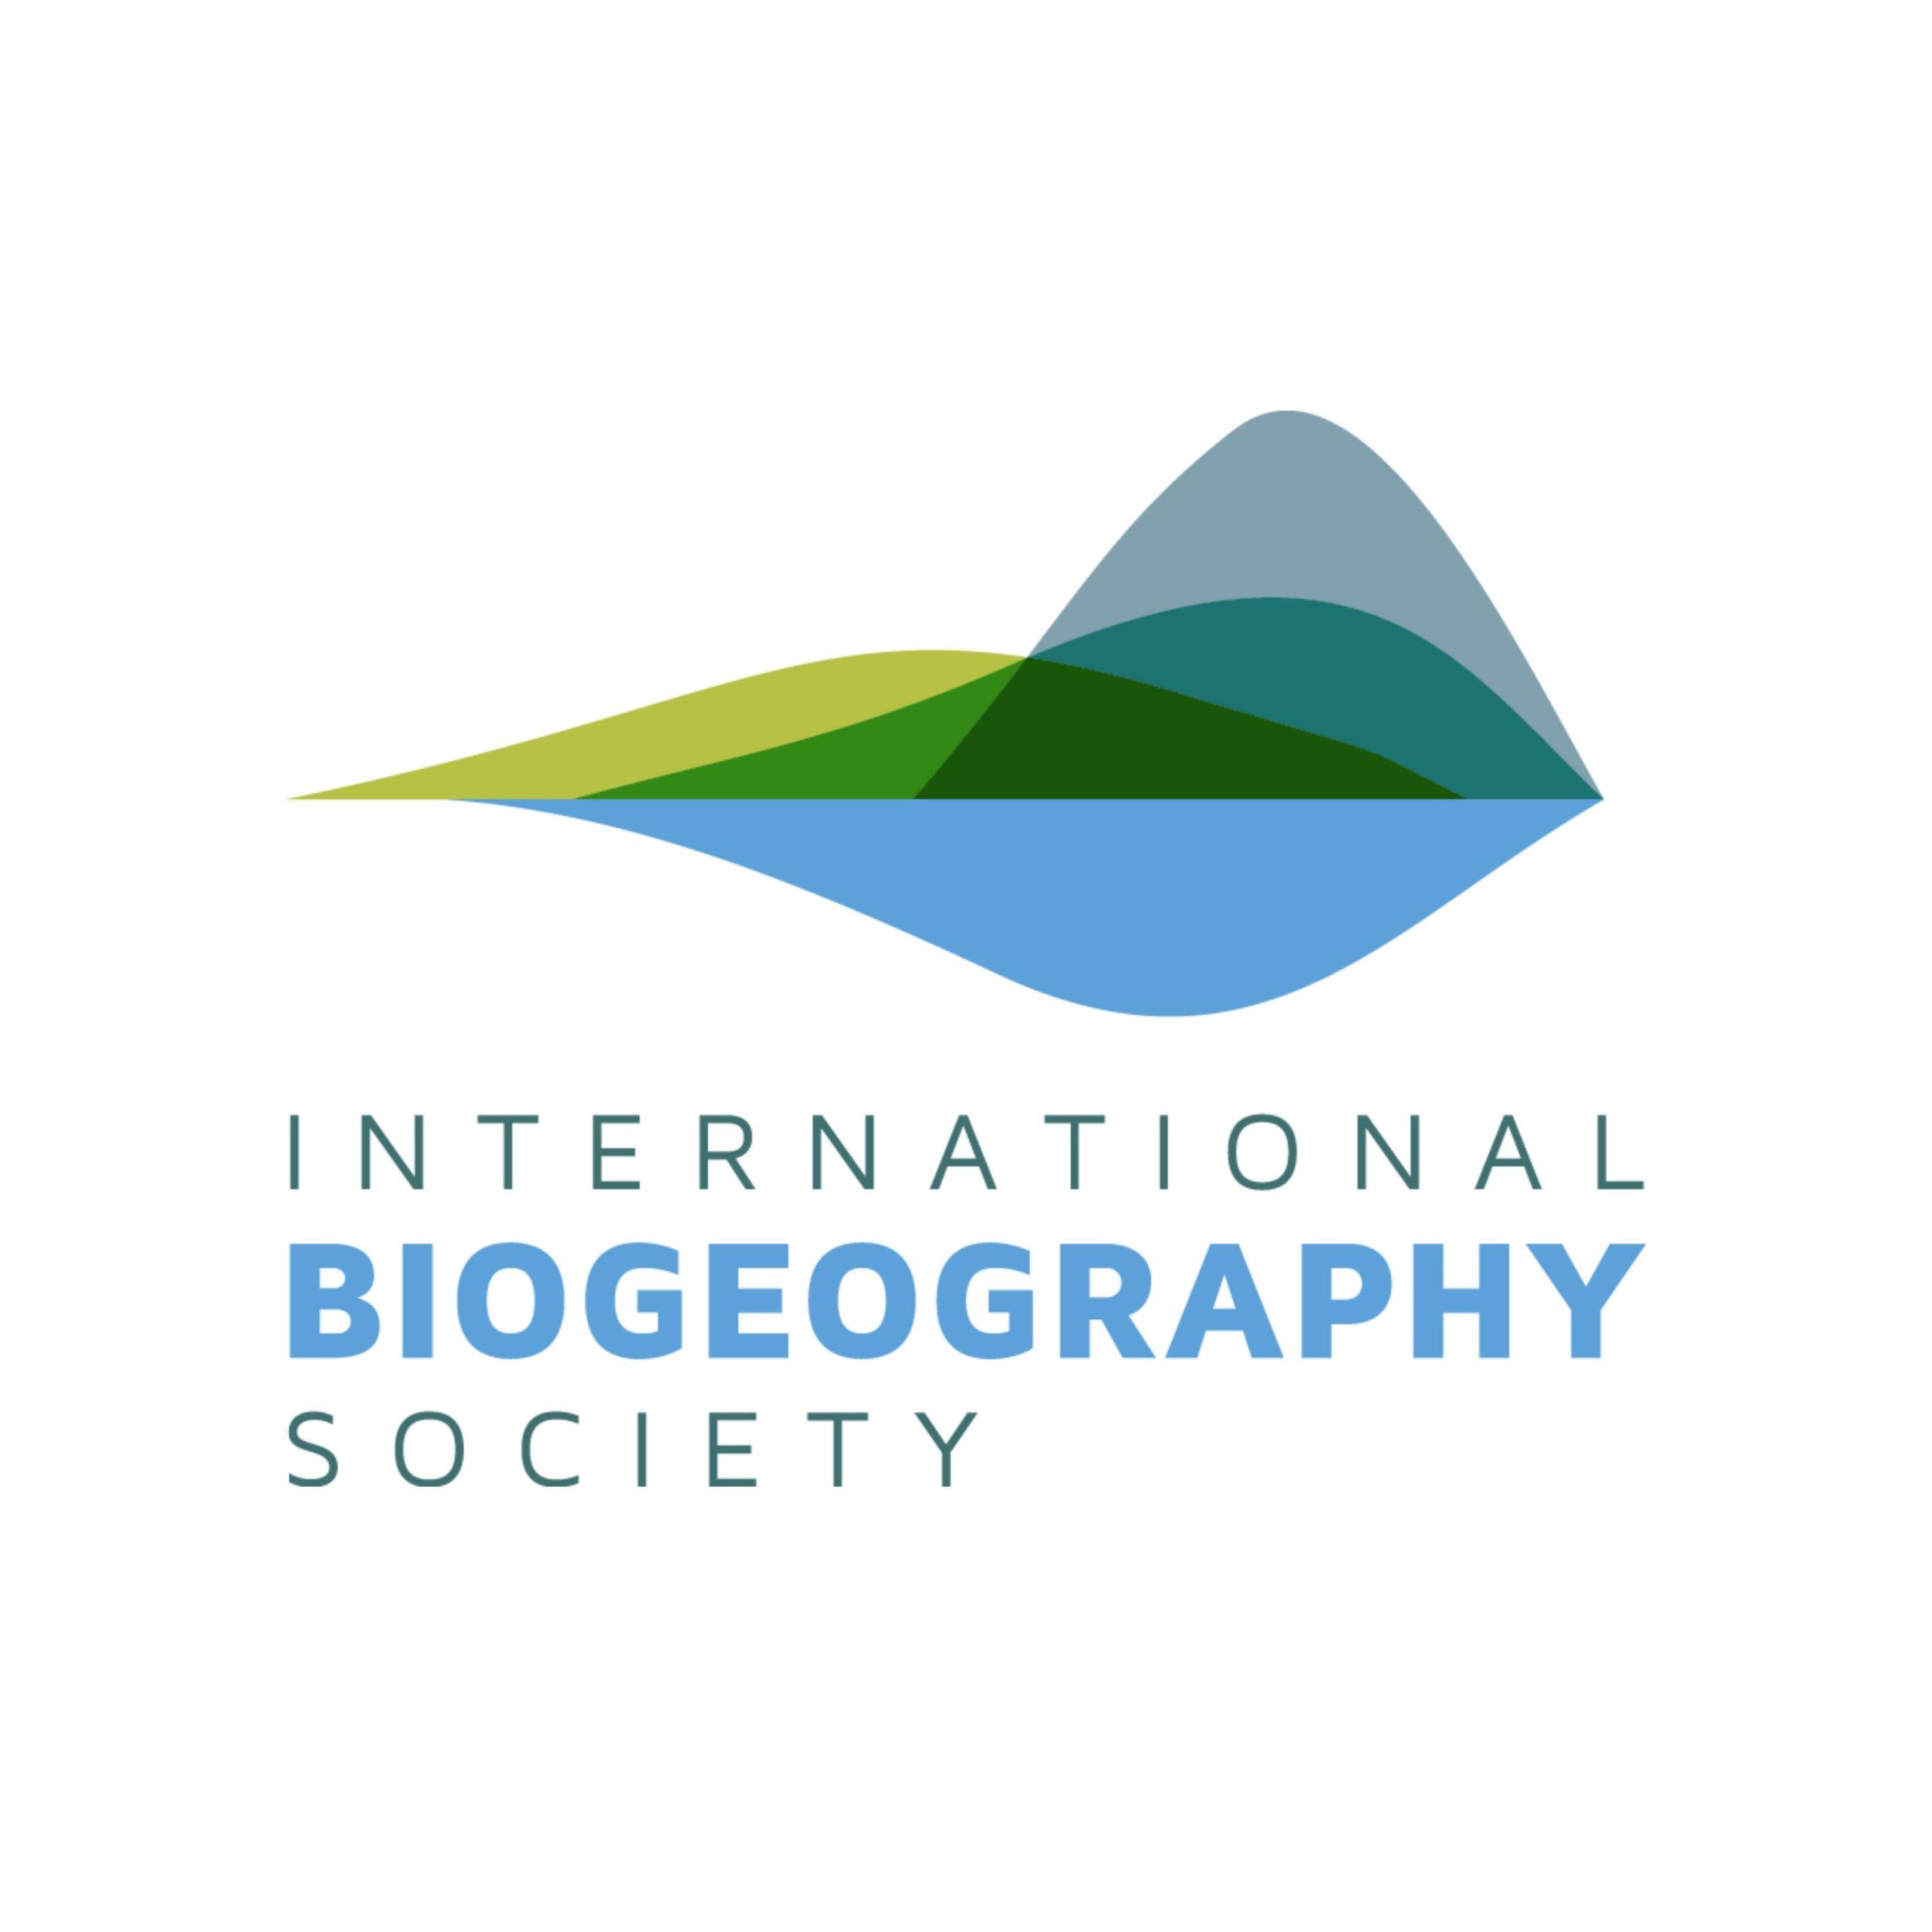 The International Biogeography Society